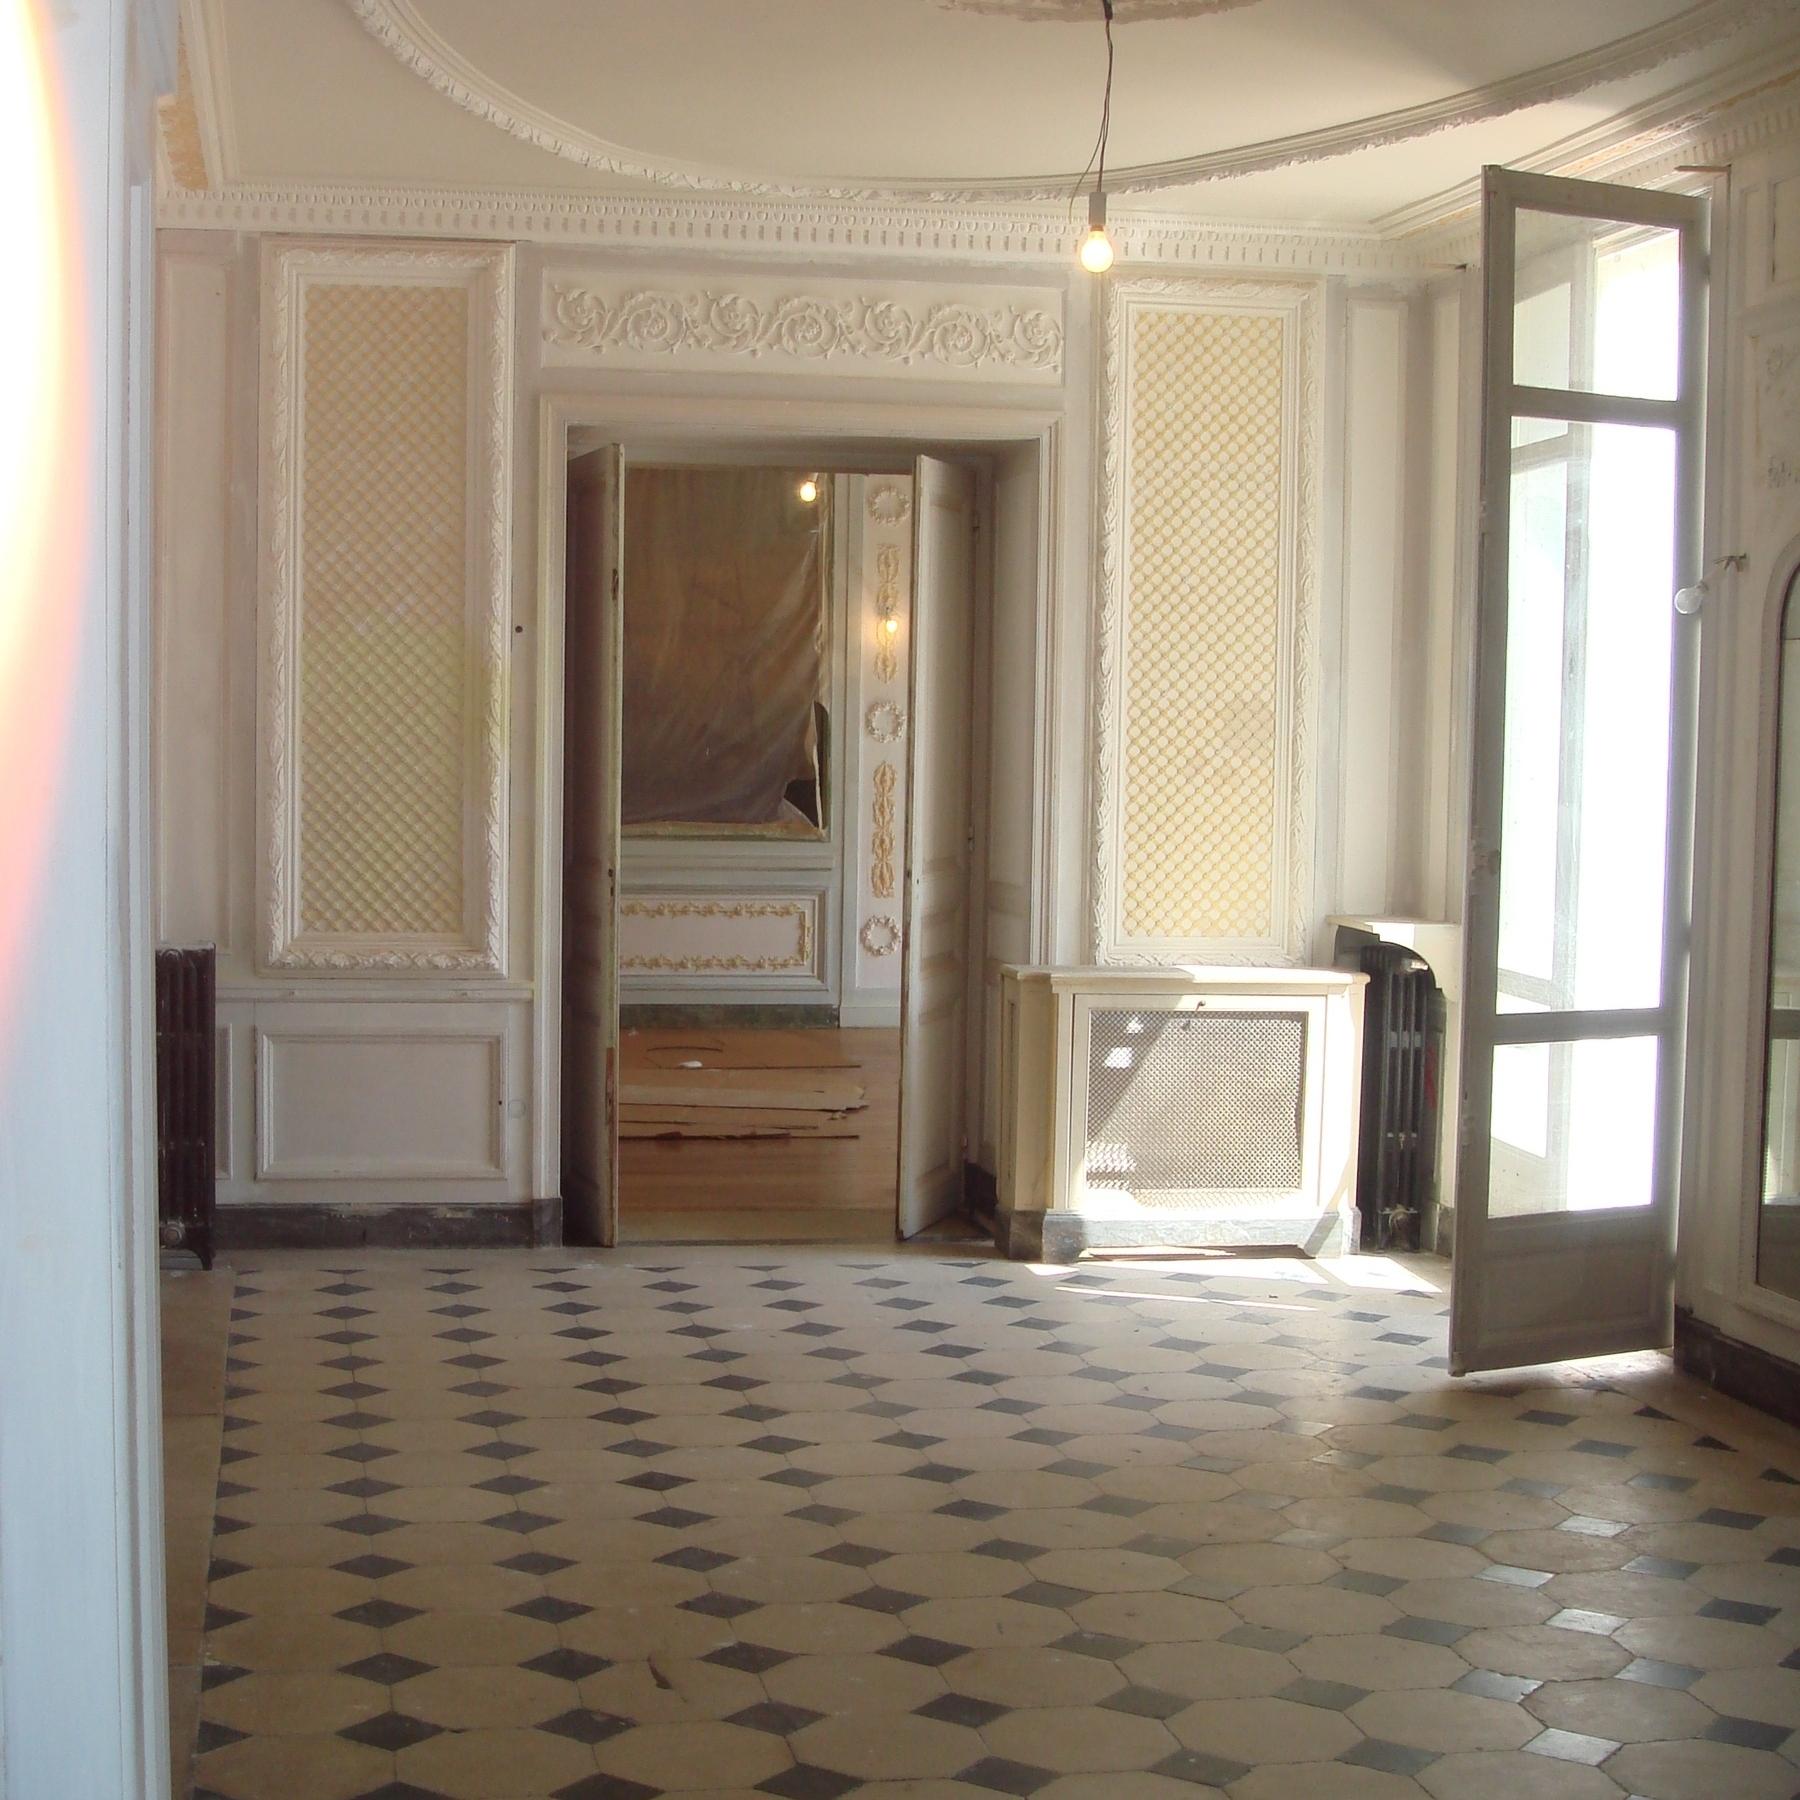 Accueil for Interieur particulier